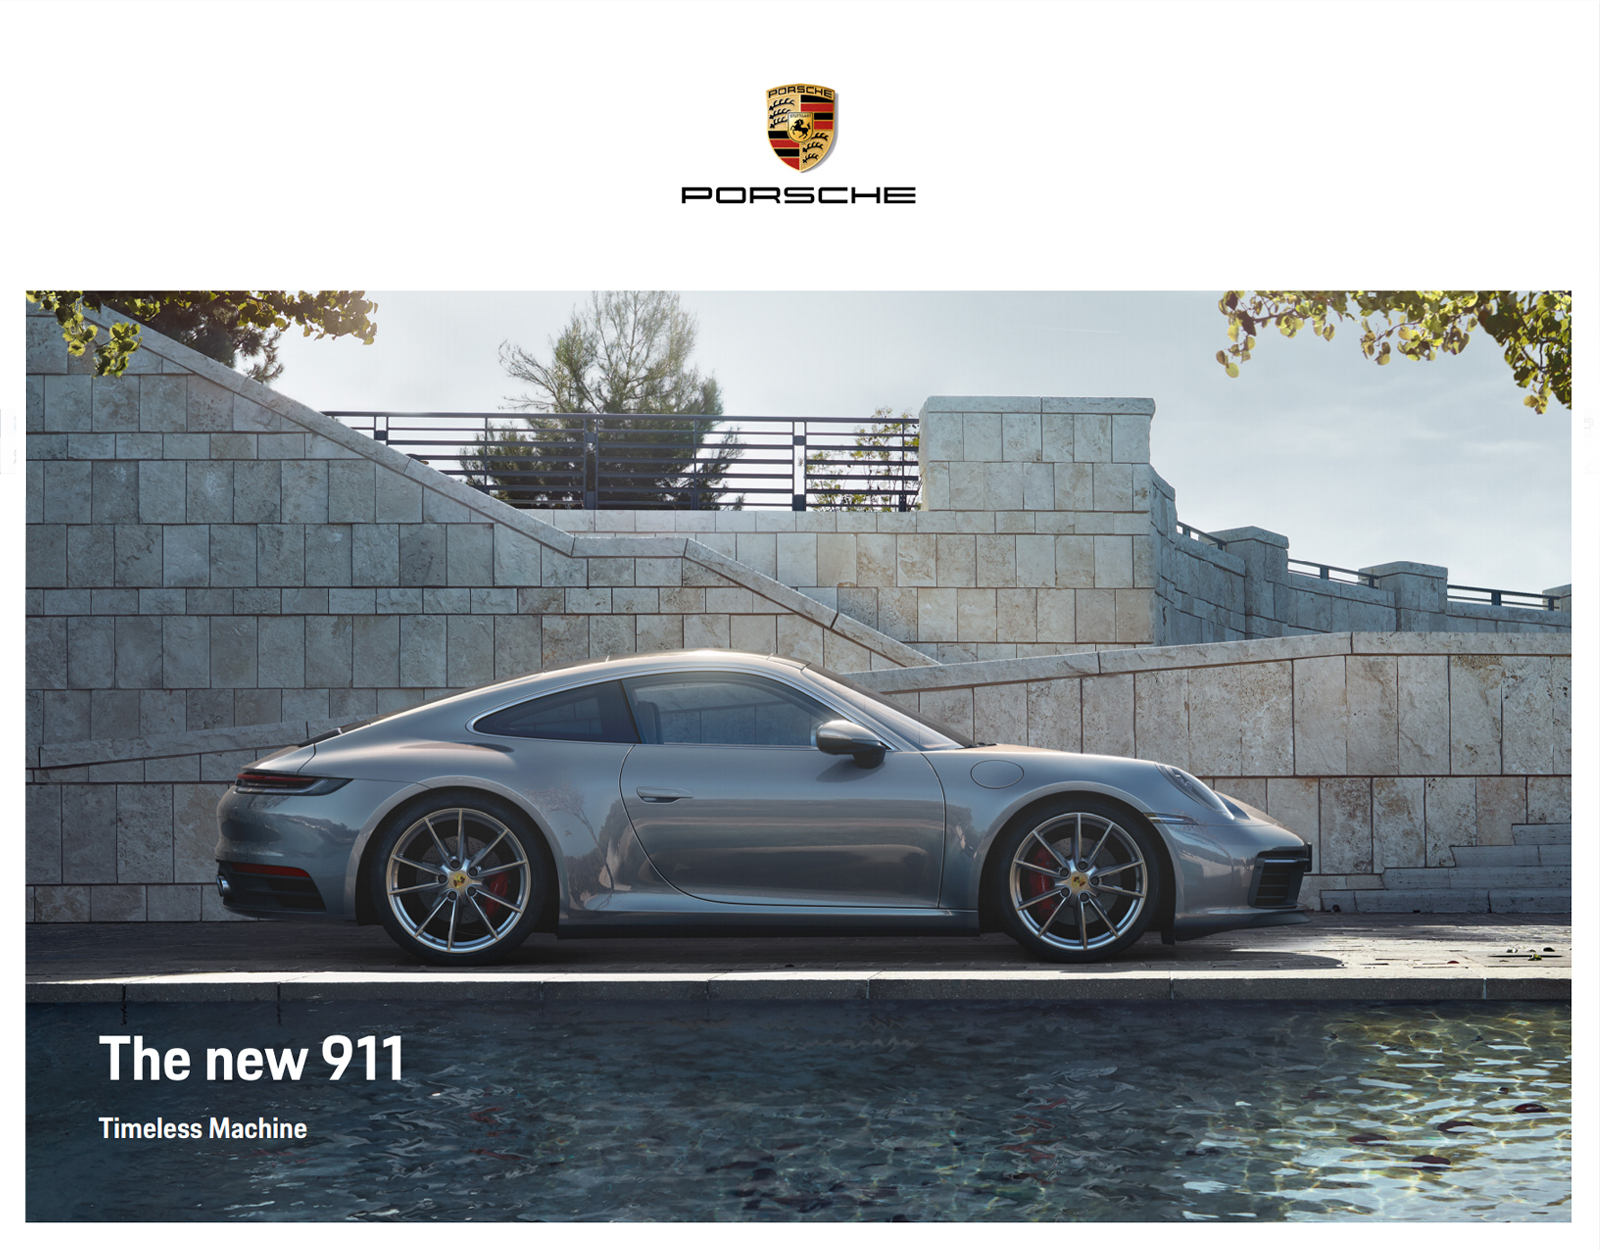 Porsche_911_992_2019_brochure.jpg